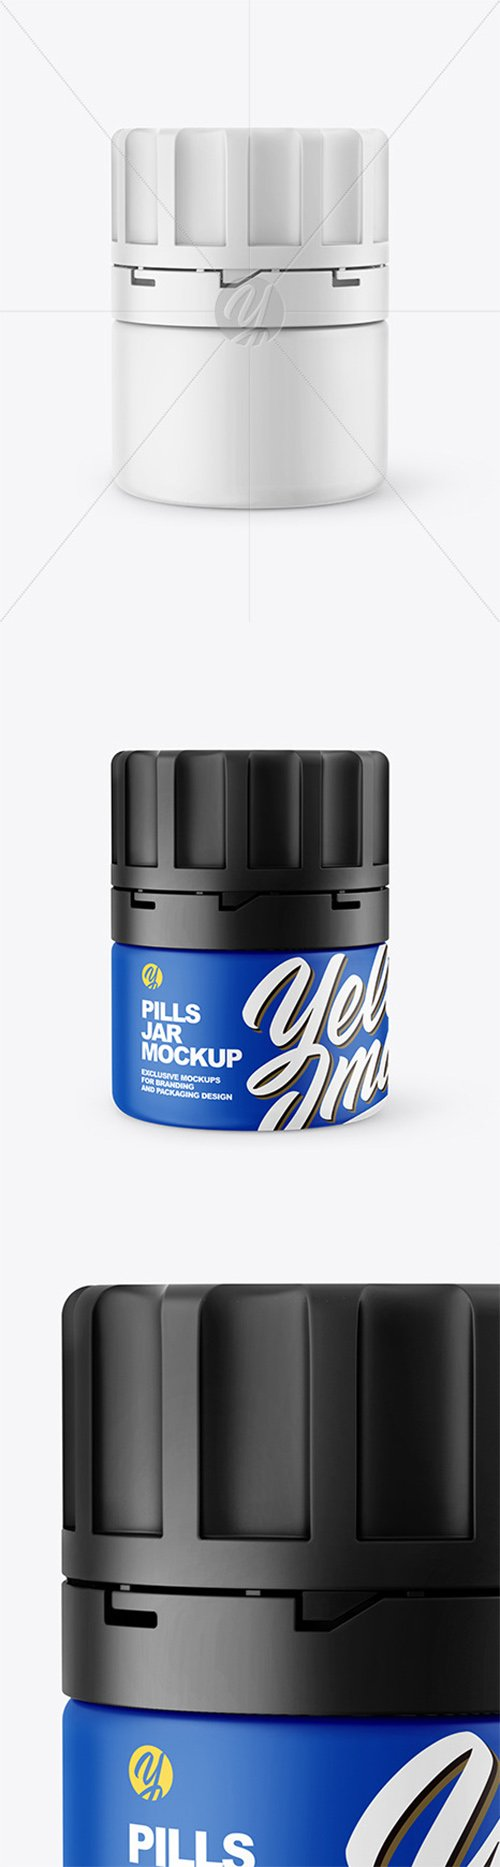 Matte Pills Jar Mockup 60871 TIF